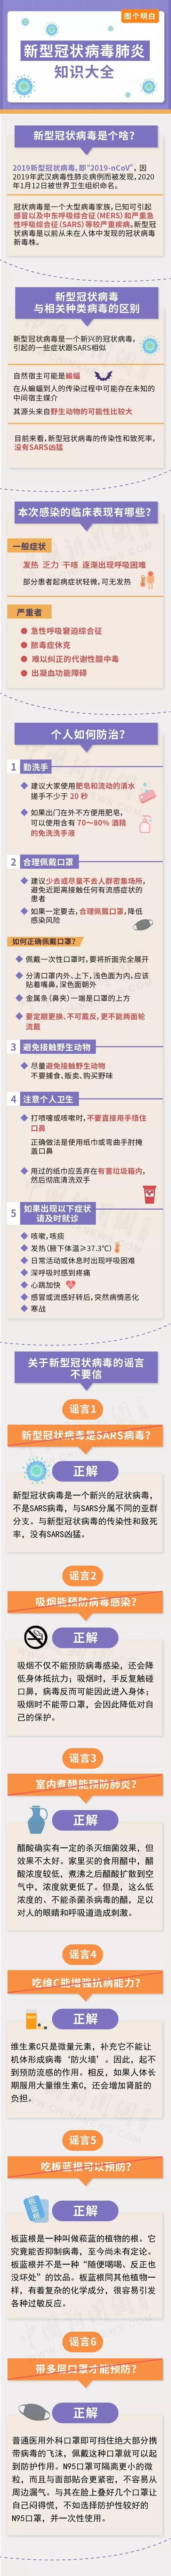 http://www.mogeblog.com/jiayongdianqi/1650849.html